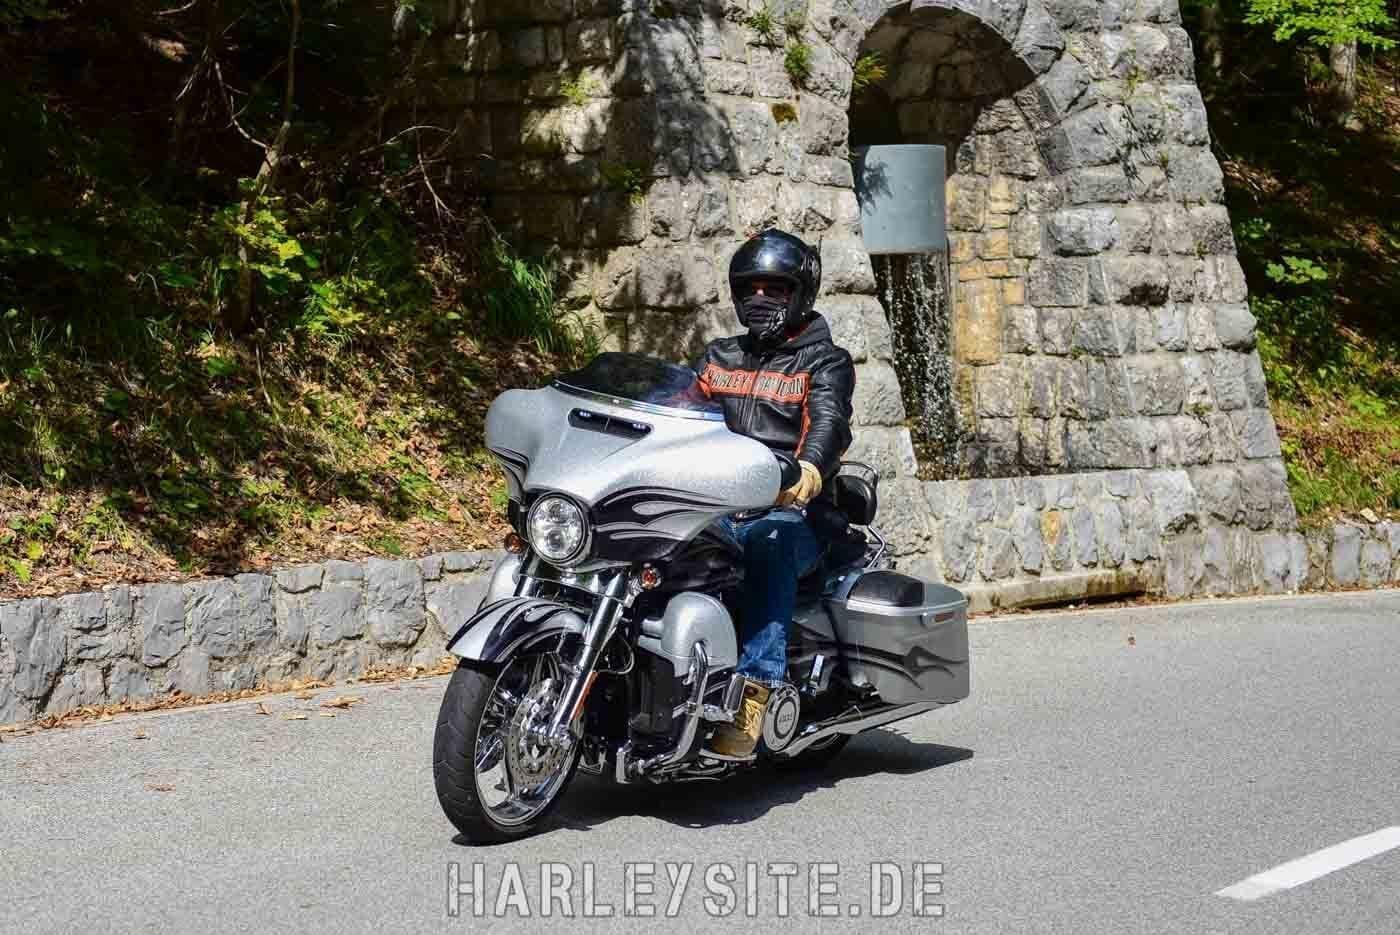 HArley-DAvidson Street Glide CVO kommt uns auf dem Bergpass entgegen